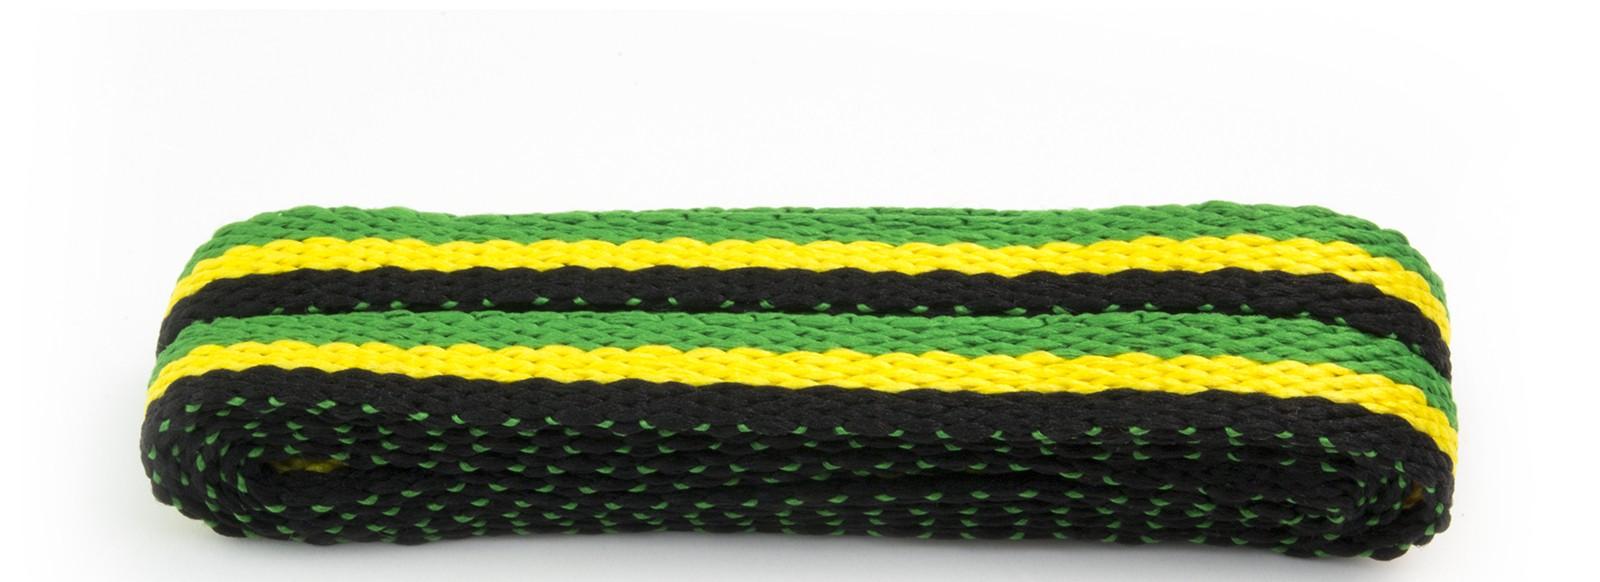 Sneaker Black/green/yell Stripes